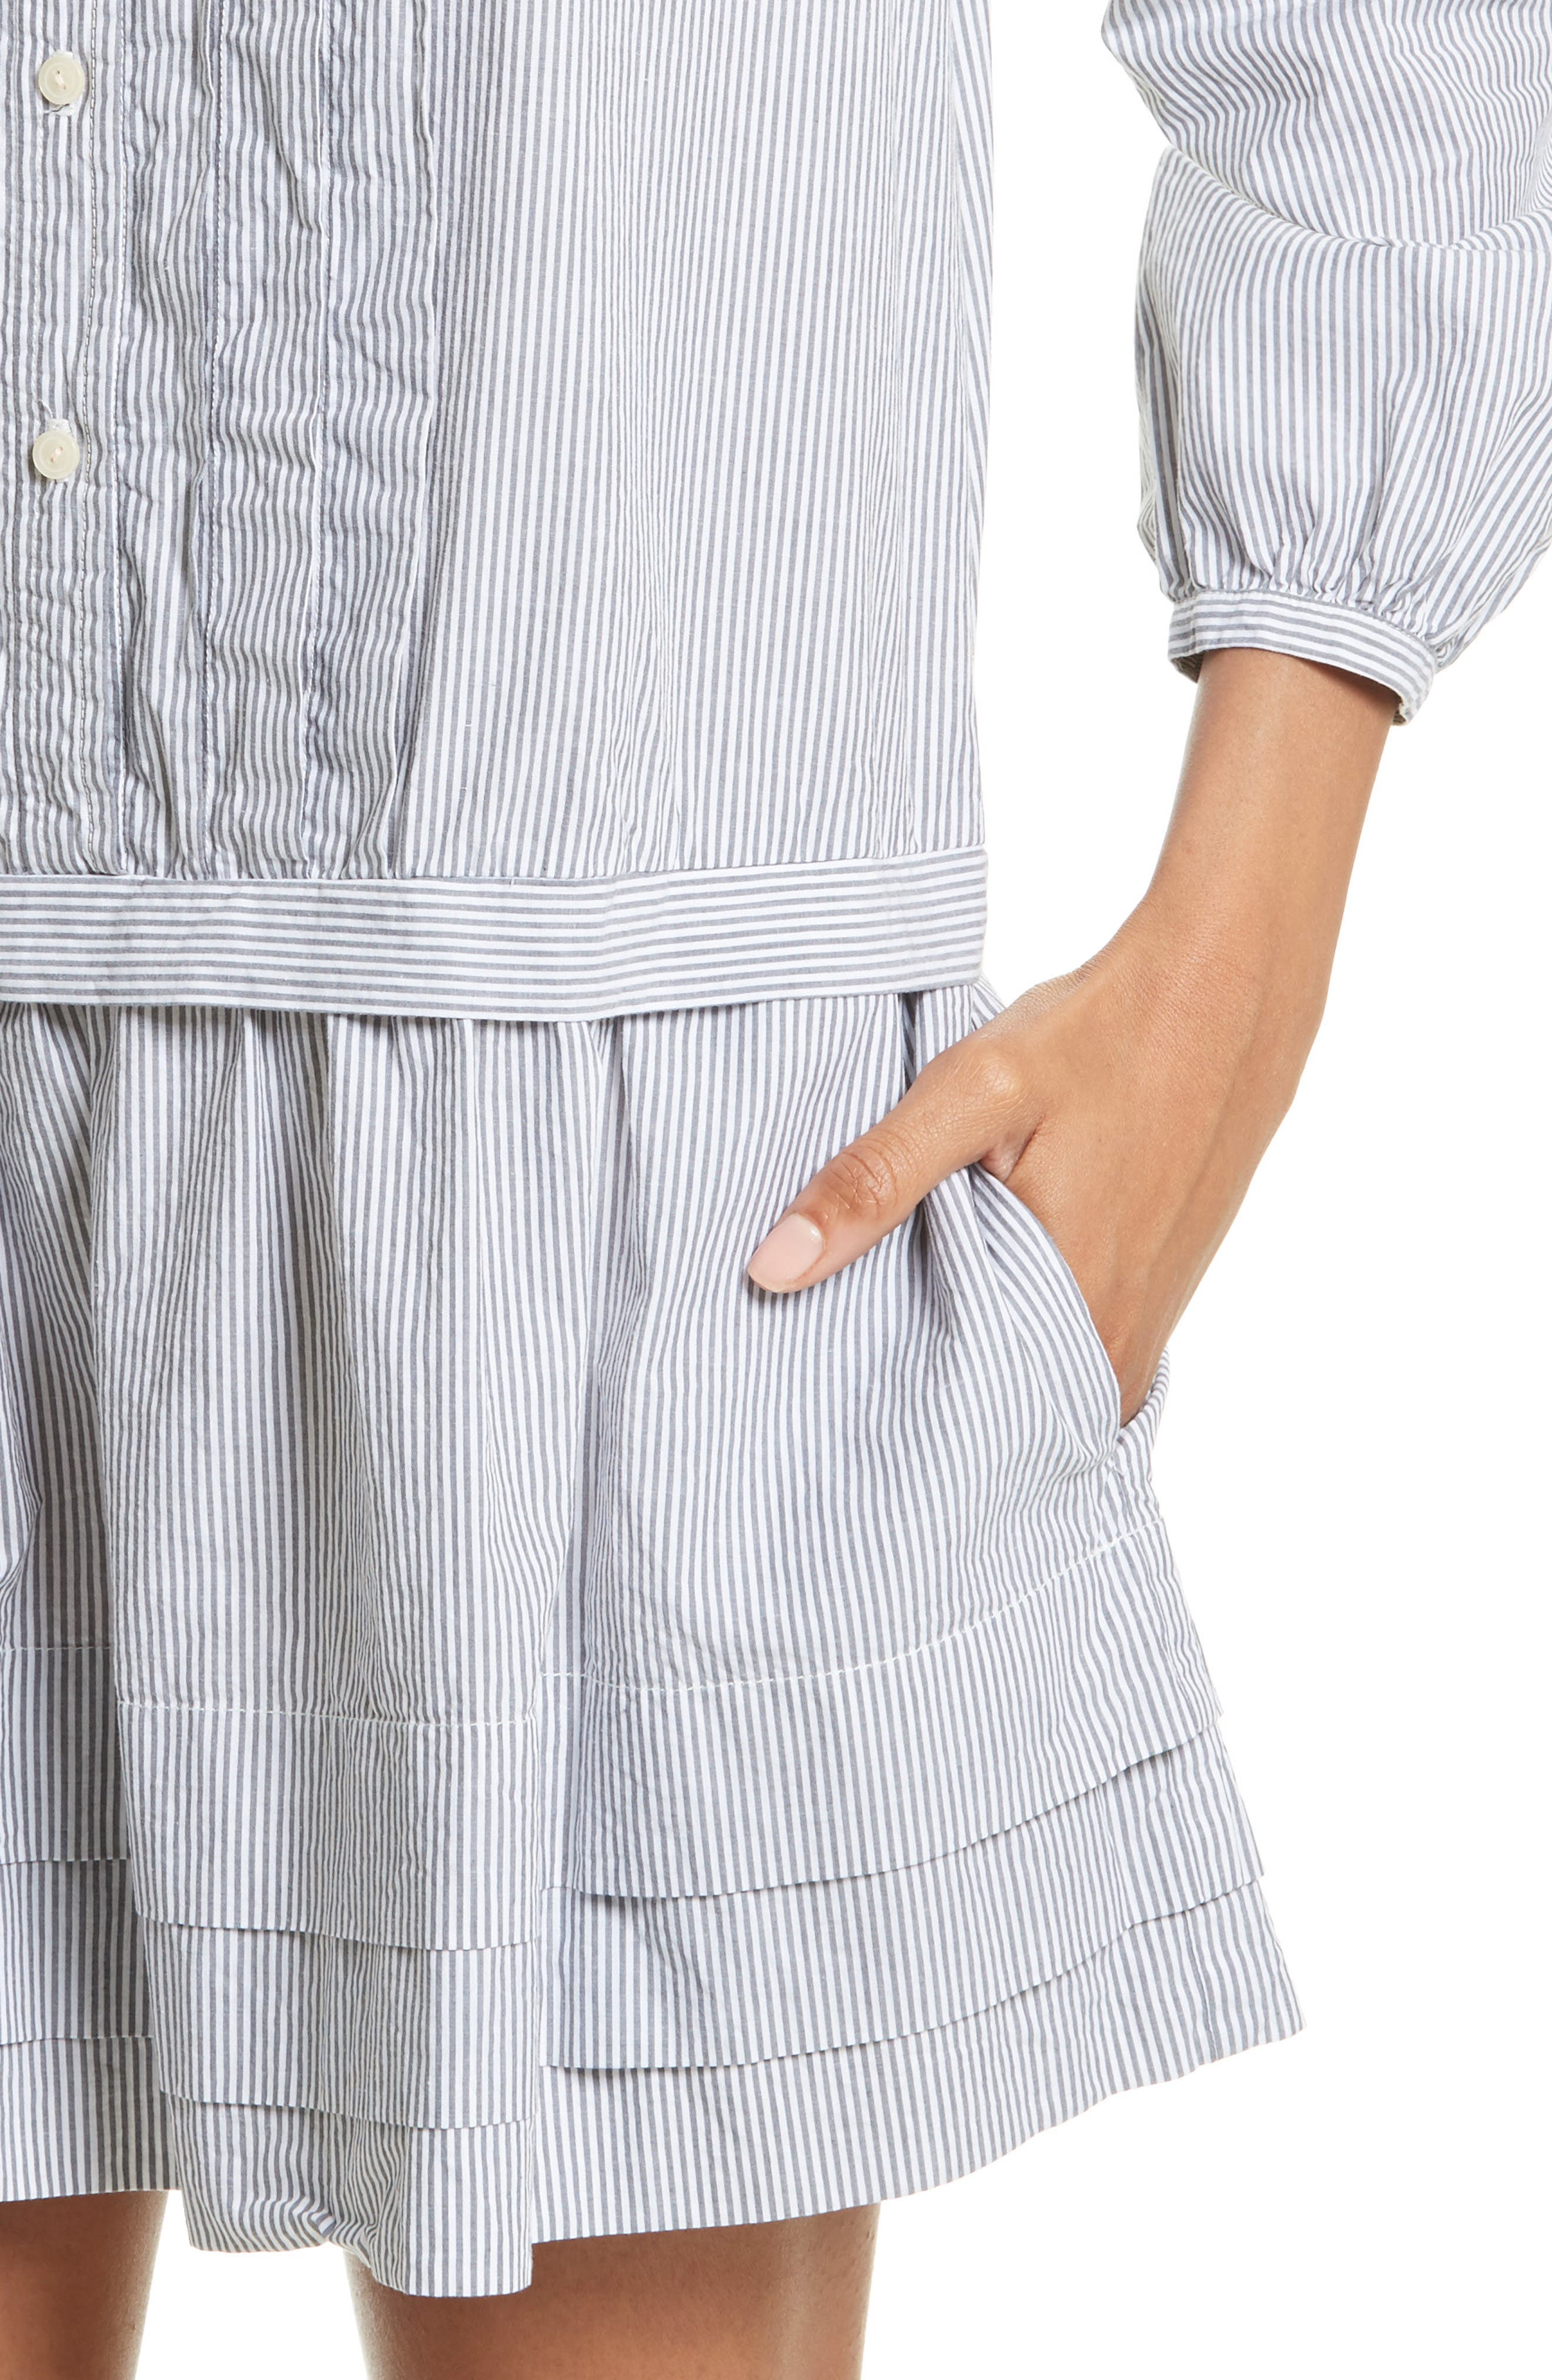 Cotton Shirtdress,                             Alternate thumbnail 4, color,                             Black/ Milk